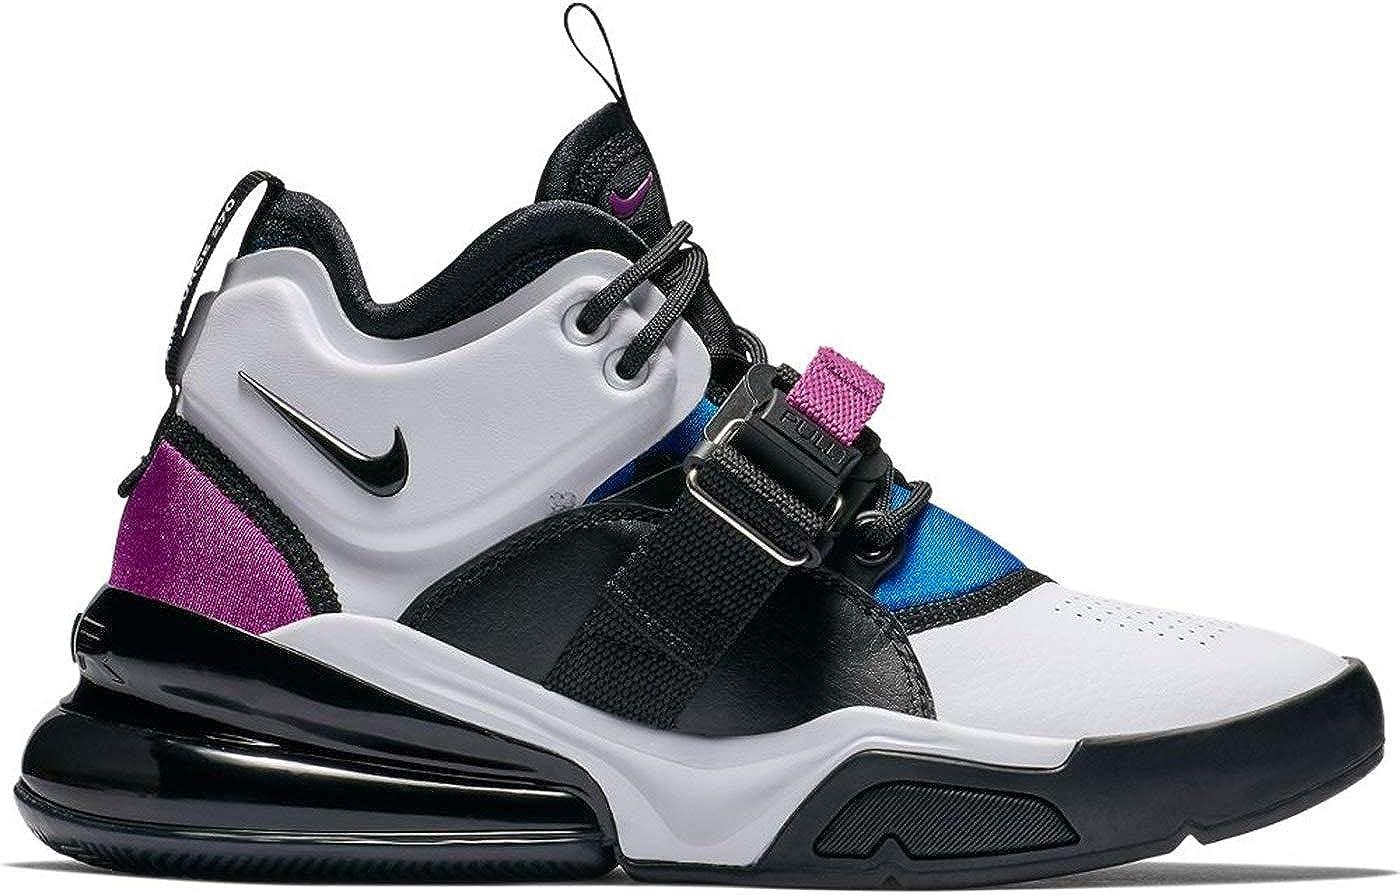 Marina Tomar un baño Calamidad  Amazon.com | Nike Kids Air Force 270 Shoes (gs) (White/Black-Lyon Blue,  Size 5.5 M US Big Kid) | Basketball